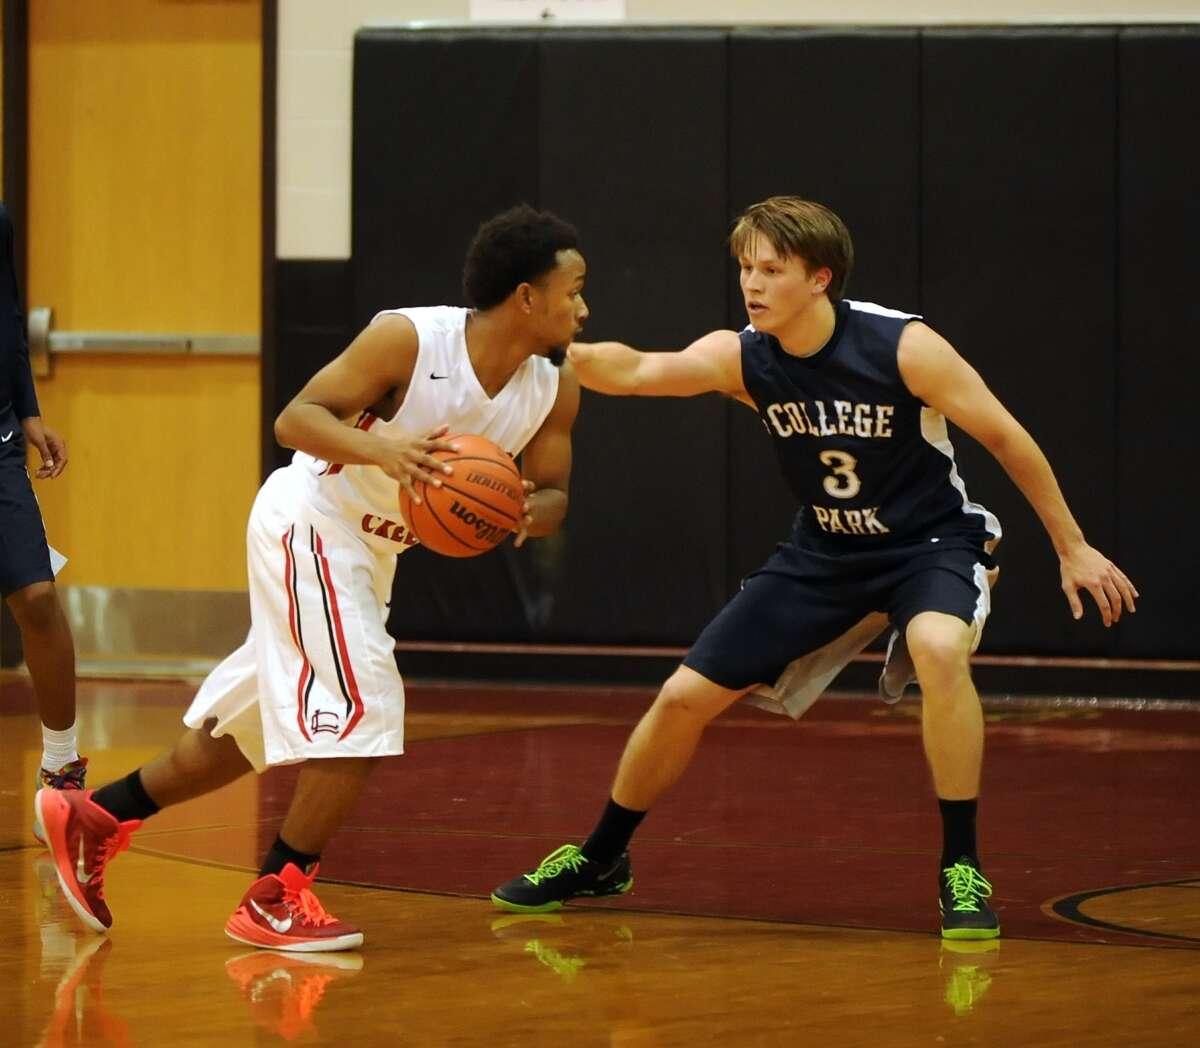 Woodlands College Park visited Langham Creek High School for a basketball game. 11-17-2014. College Park won the game, 59-54. Right, College Park's Chandler Morris (3) applied defensive pressure on Langham Creek's D'Von England (4).